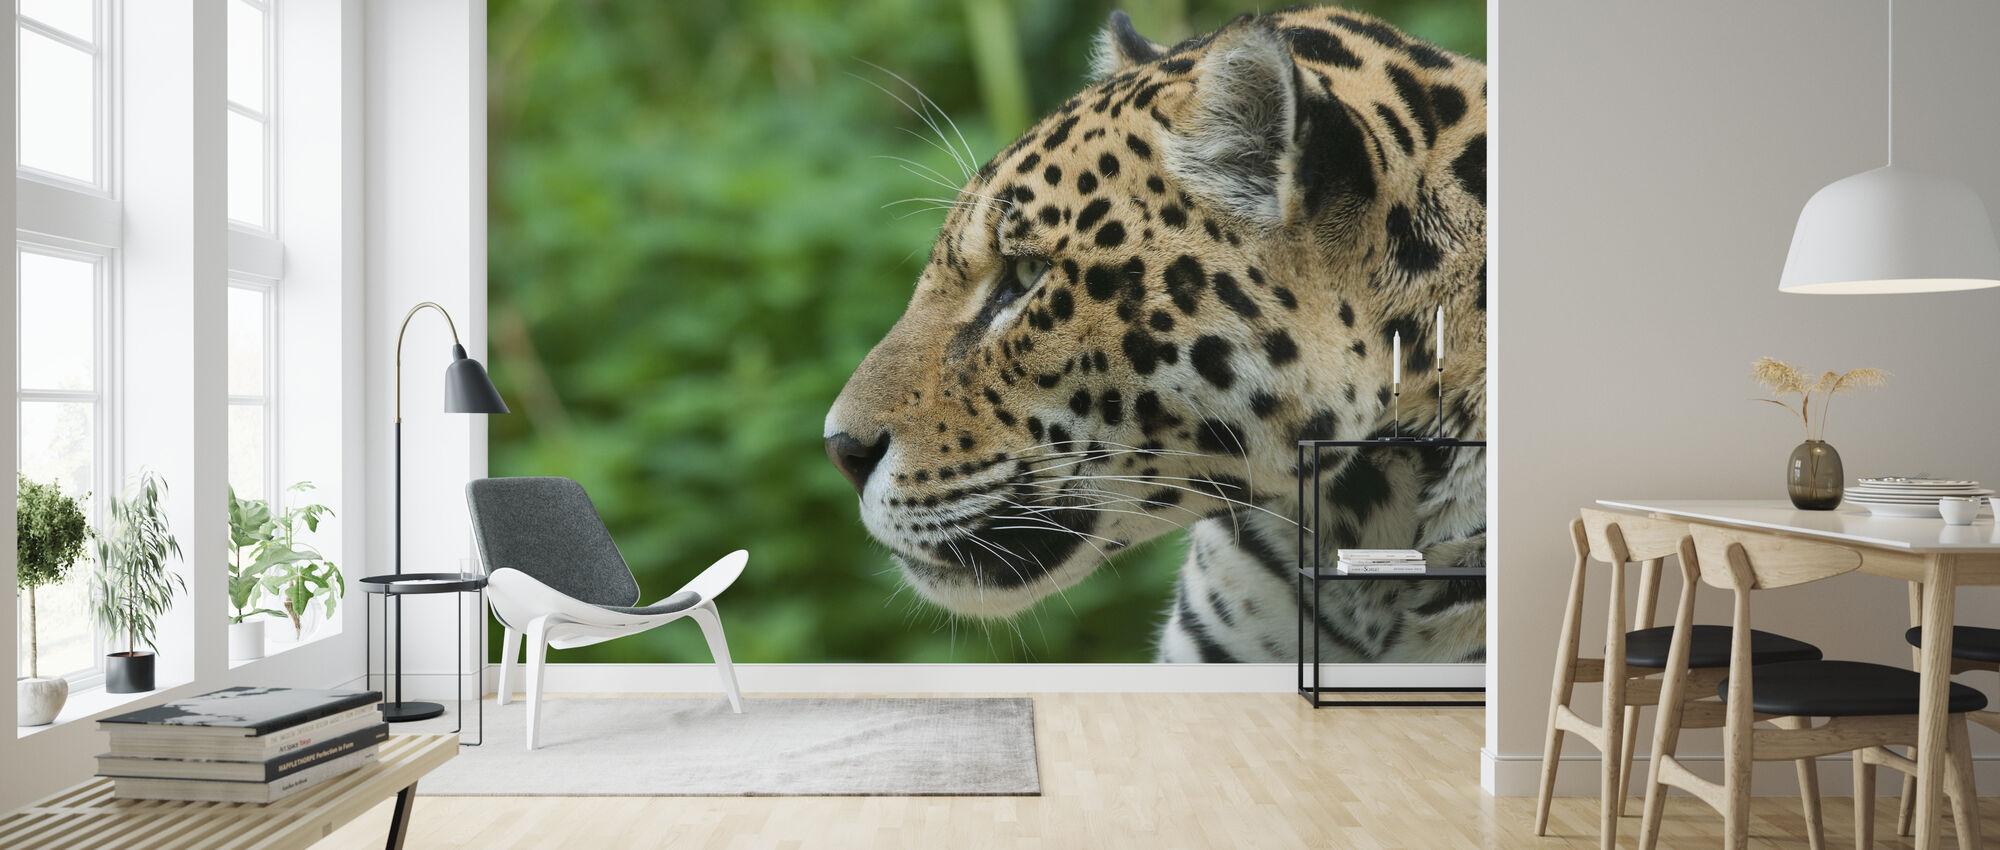 Jaguar - Behang - Woonkamer